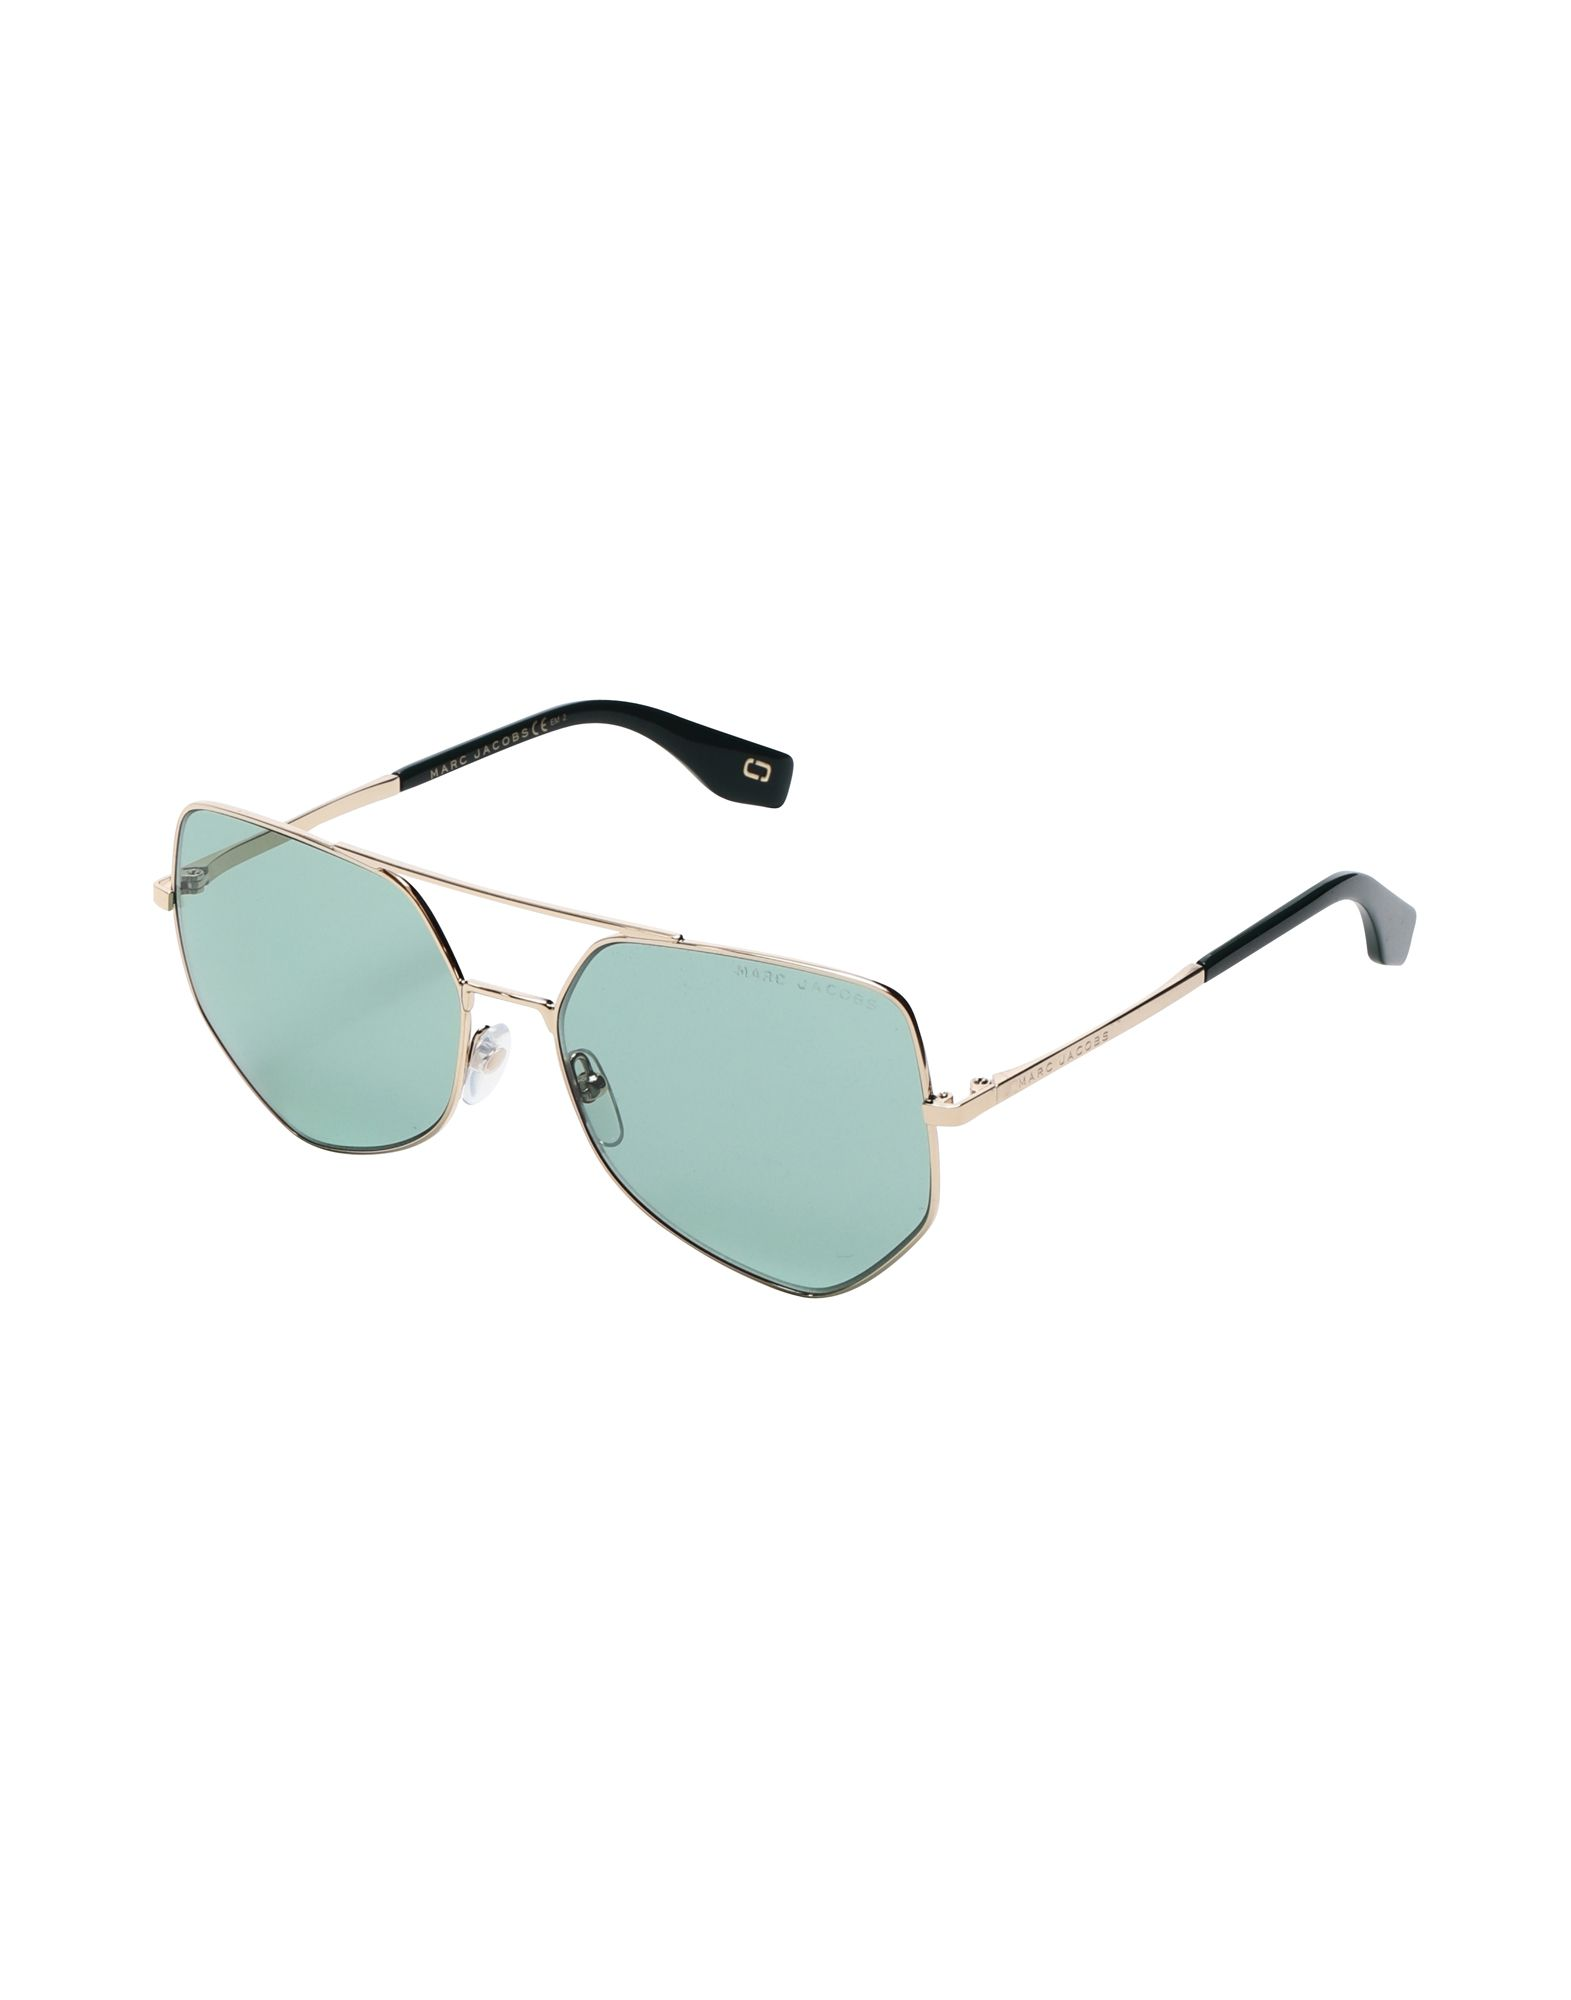 Фото - MARC JACOBS Солнечные очки 3d очки